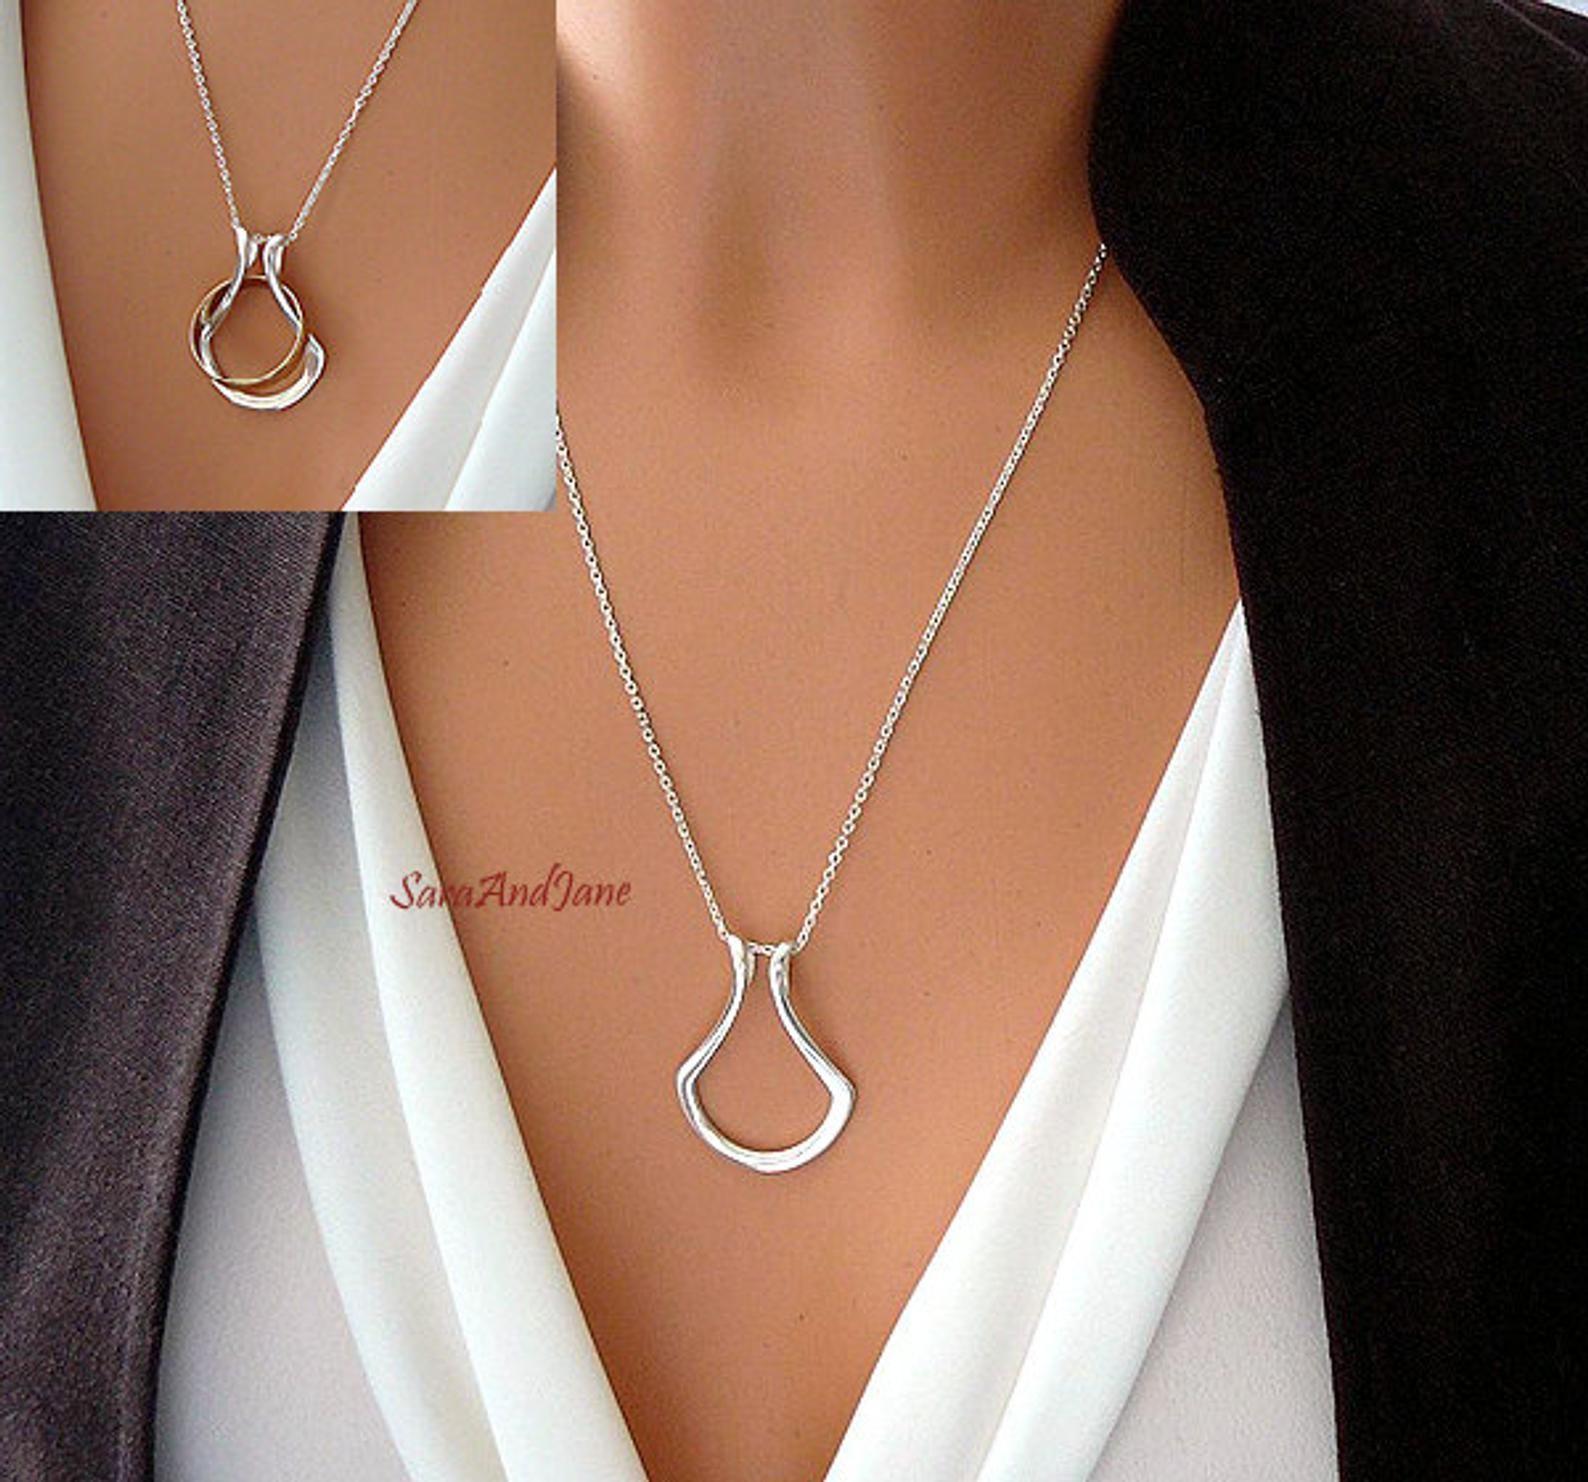 Ring Holder Necklace Silver, Gold, Rose gold vermeil